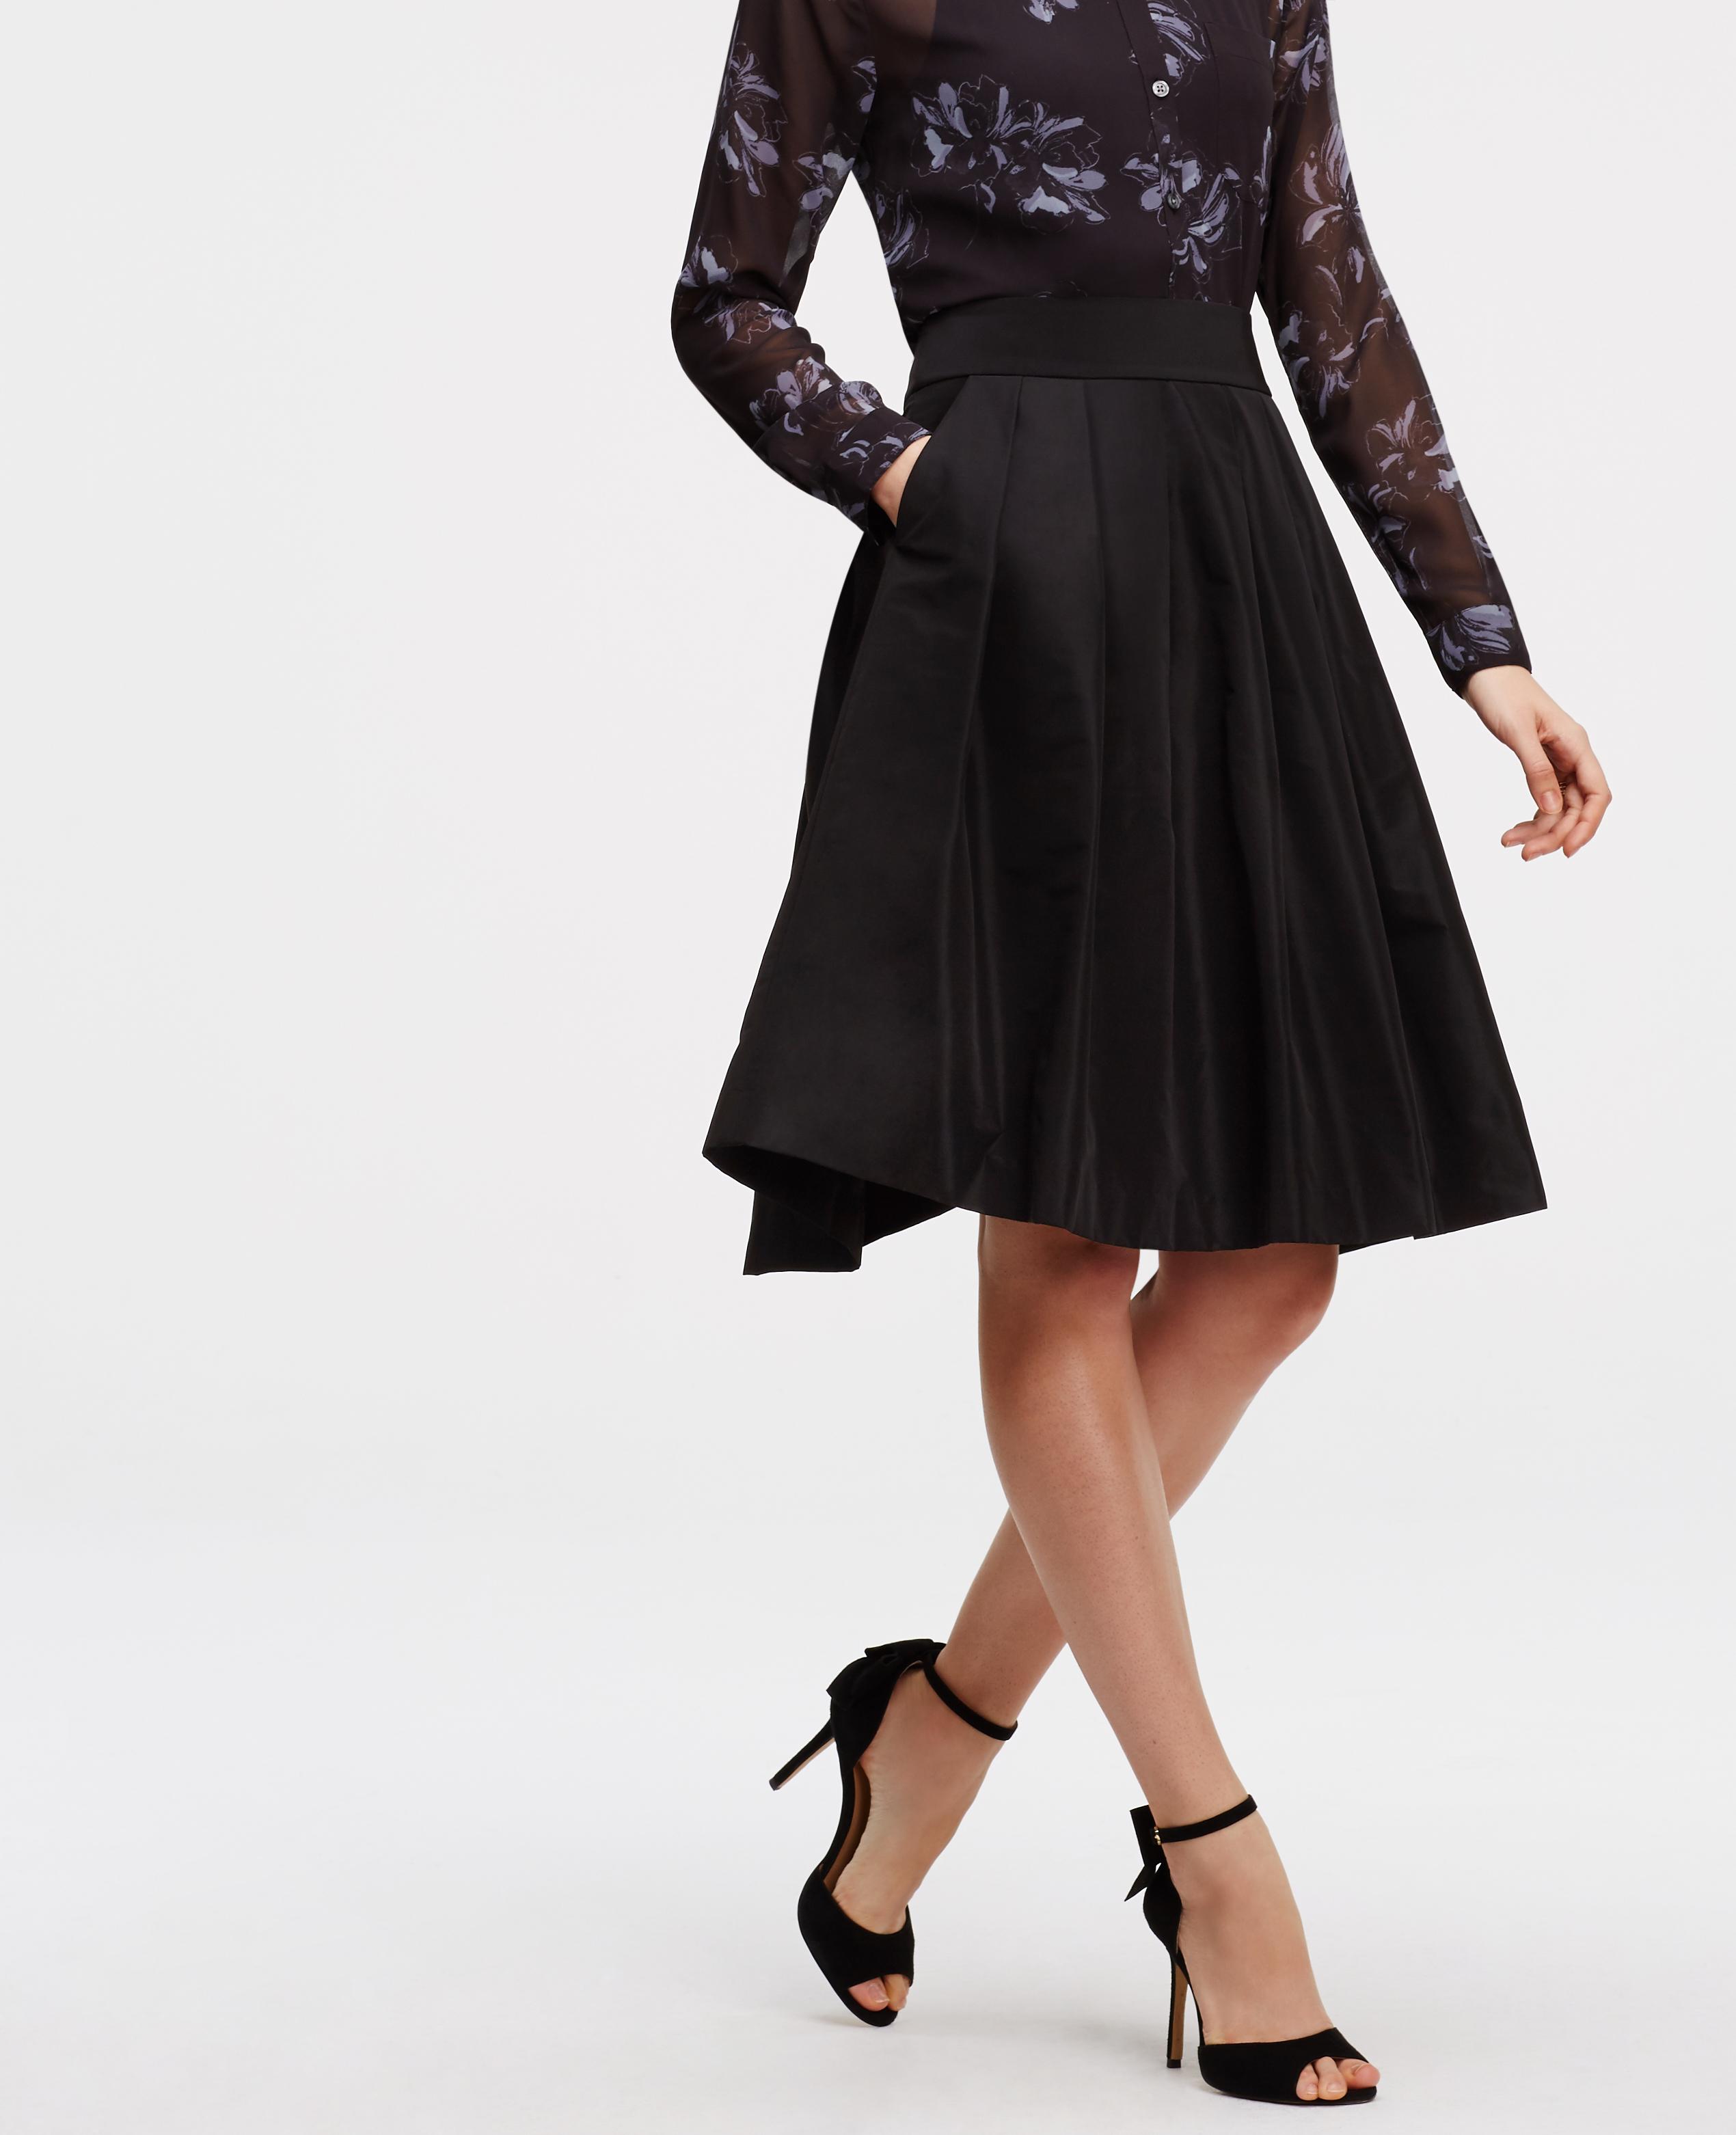 Ann taylor Pleated Taffeta Skirt in Black | Lyst